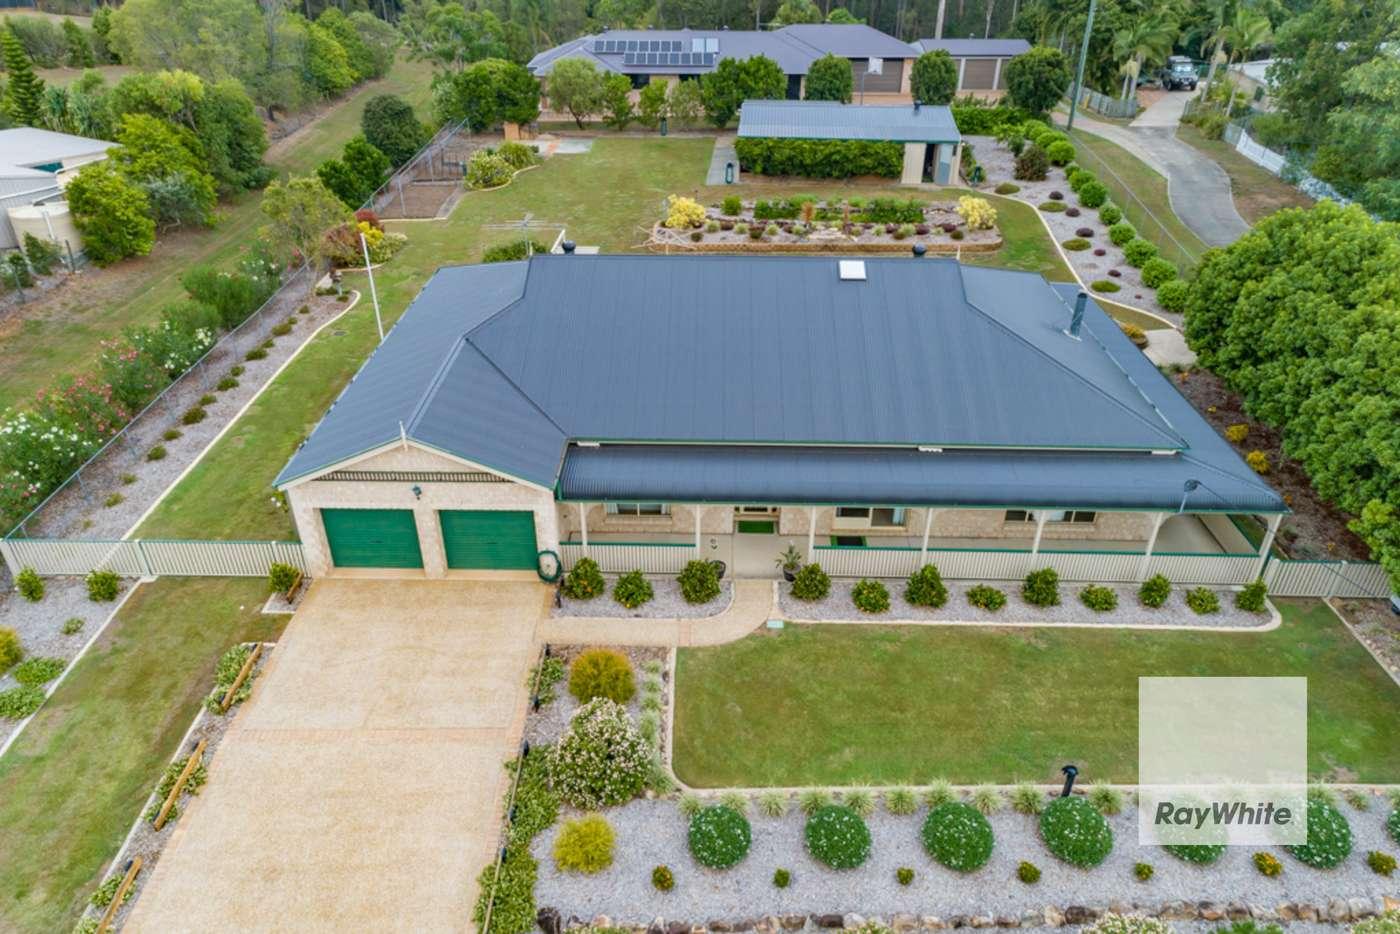 Main view of Homely house listing, 27 Fairlane Street, Joyner QLD 4500